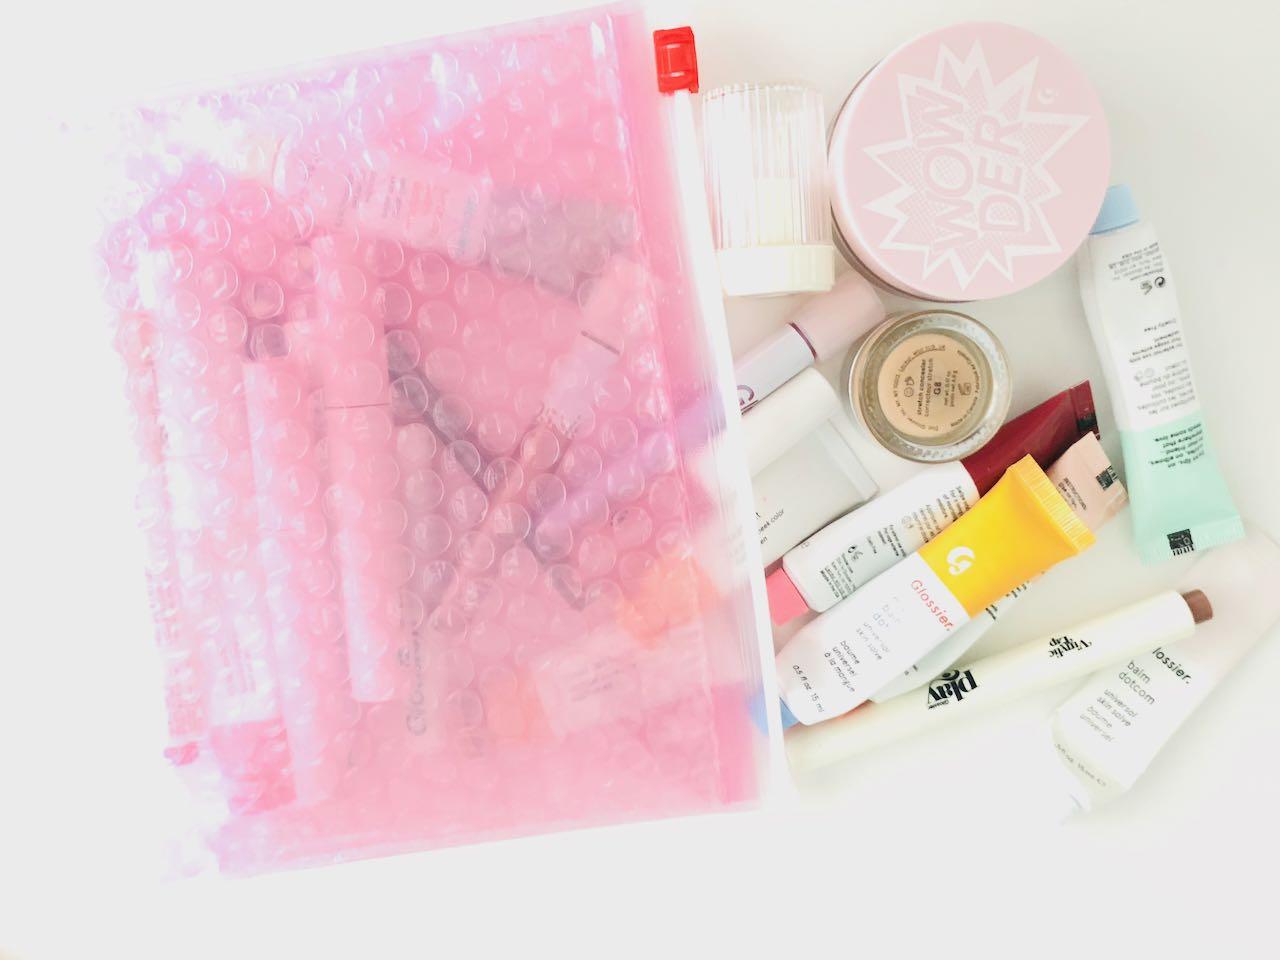 All the Glossier stuffed inside a pink bubblewrap pouch